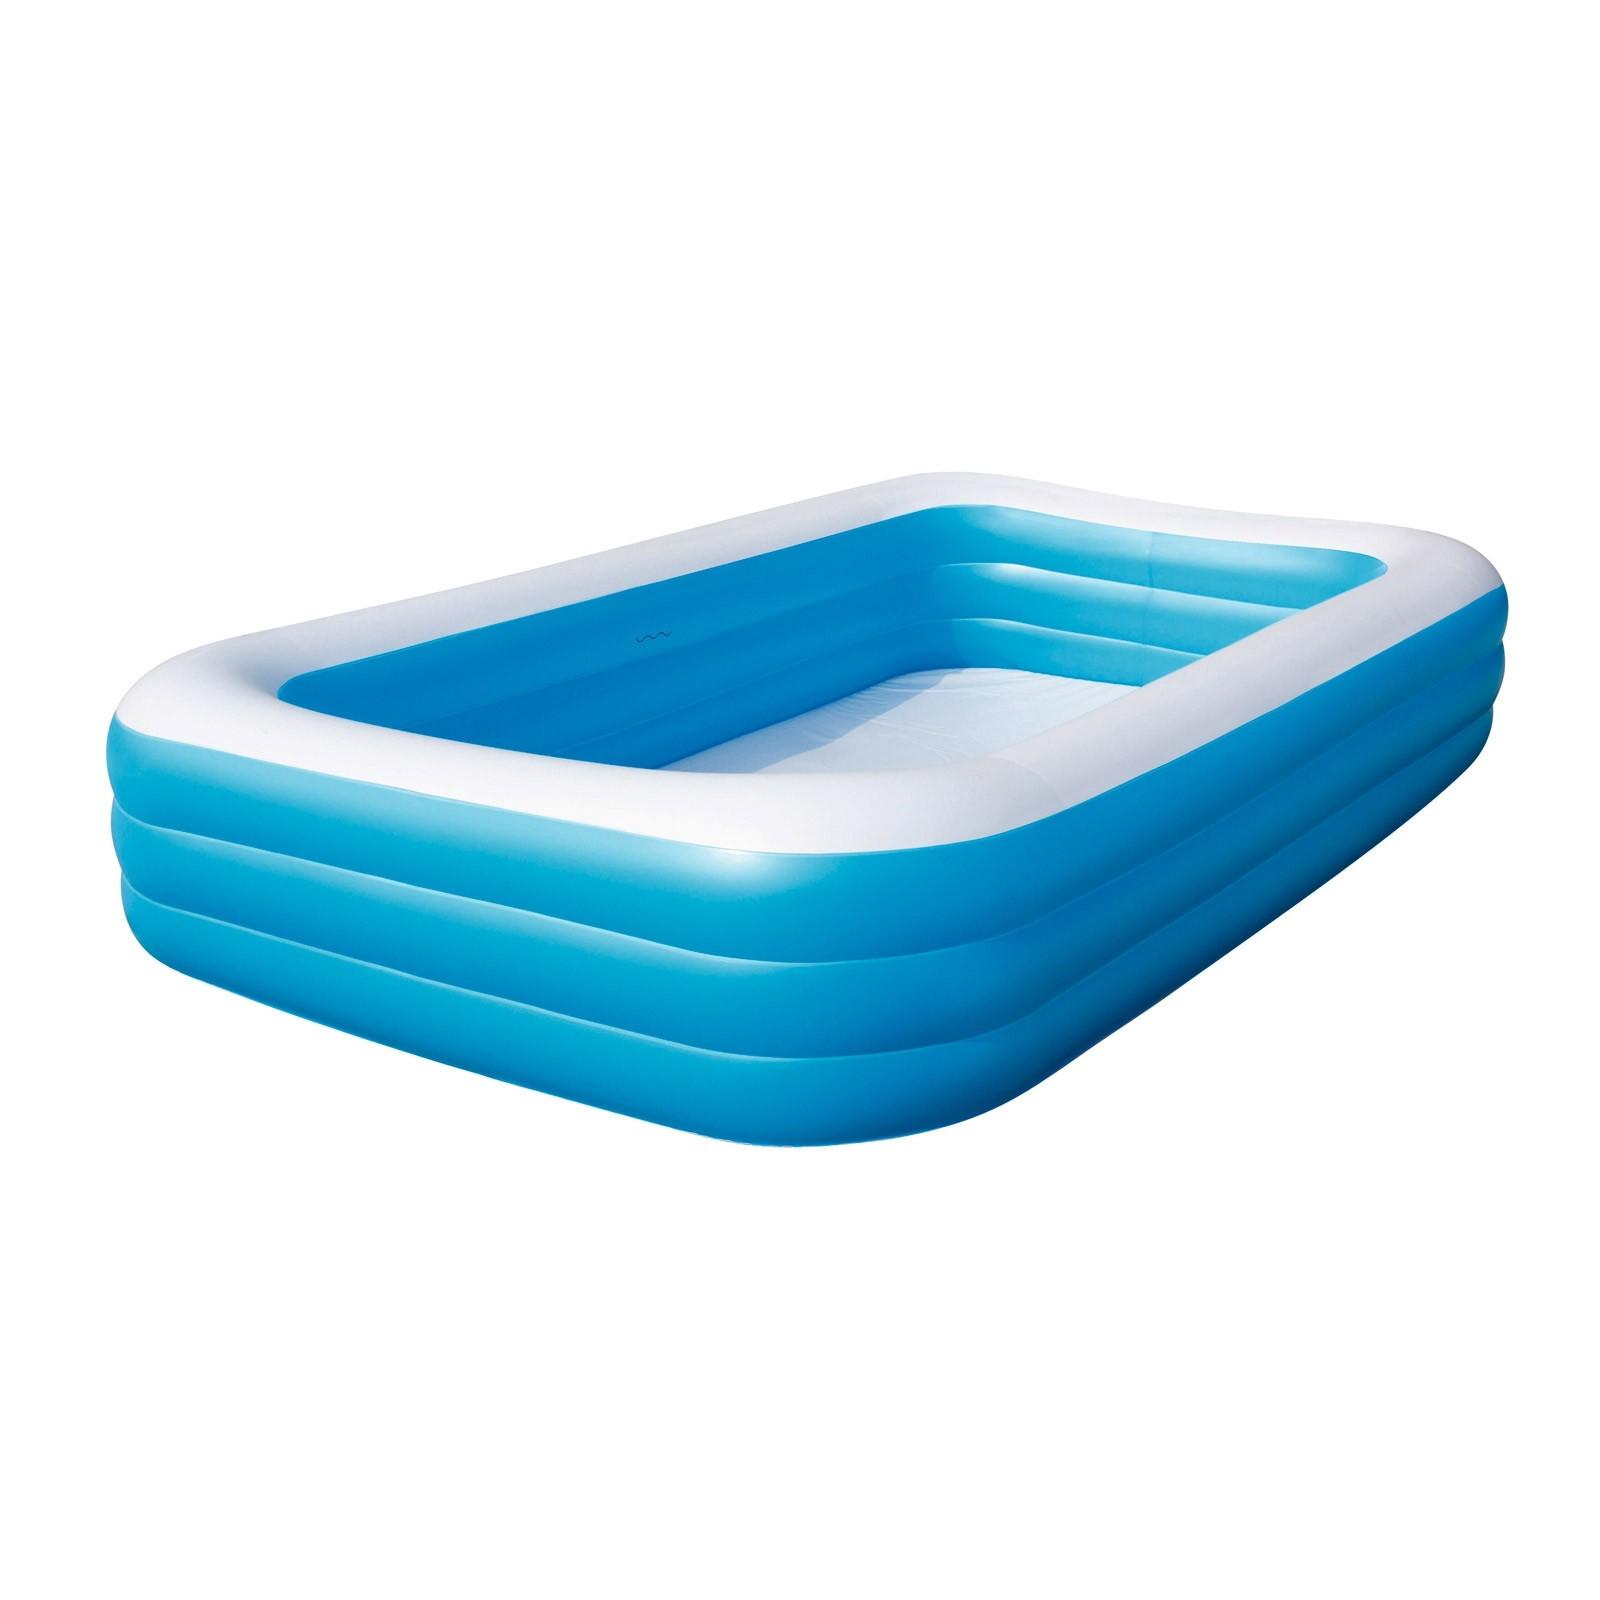 Swimmingpool / Planschbecken 305x183x56 cm